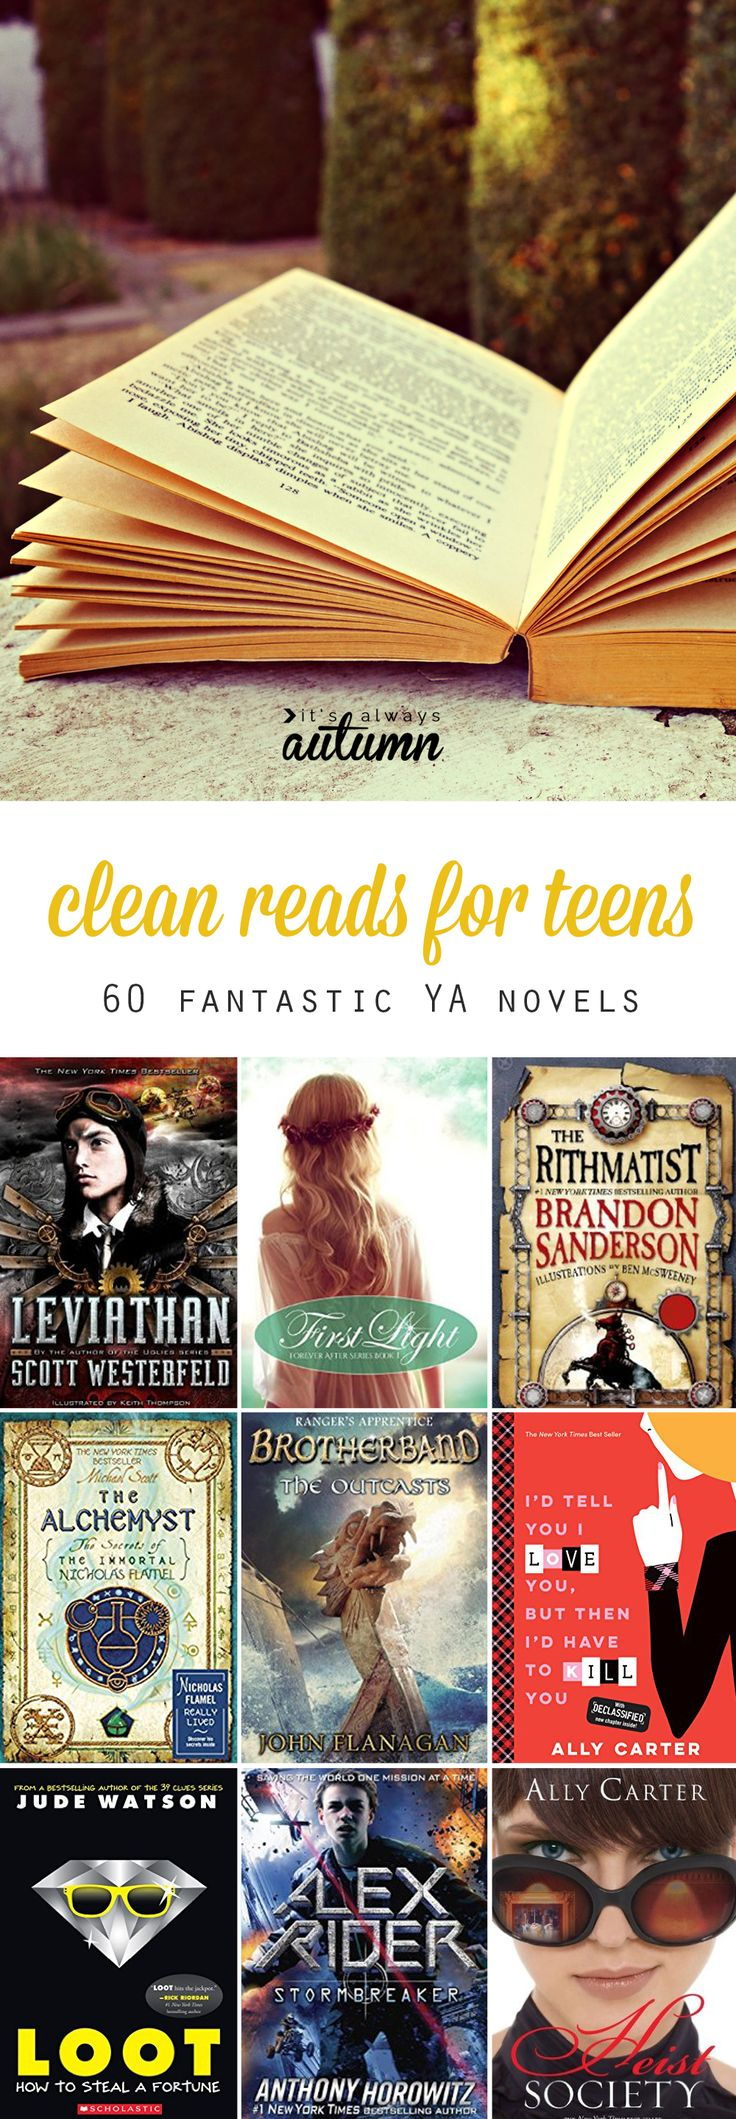 List of teen authors